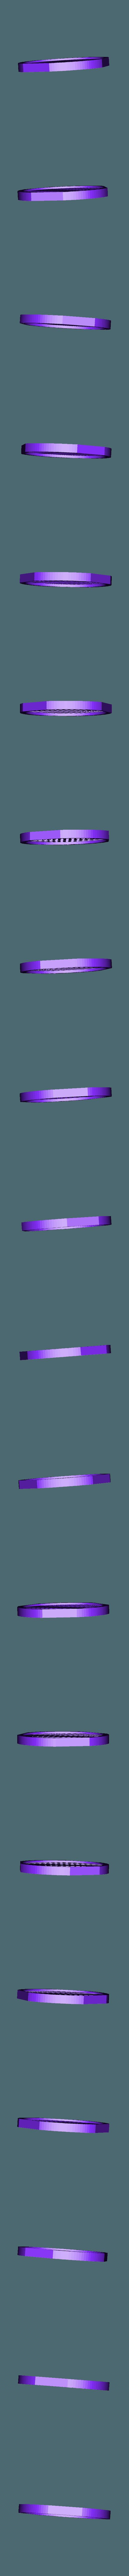 Rejilla_2.stl Download free STL file #3DvsCOVID19 Mask filters with side breathing • 3D printer object, alonsothander